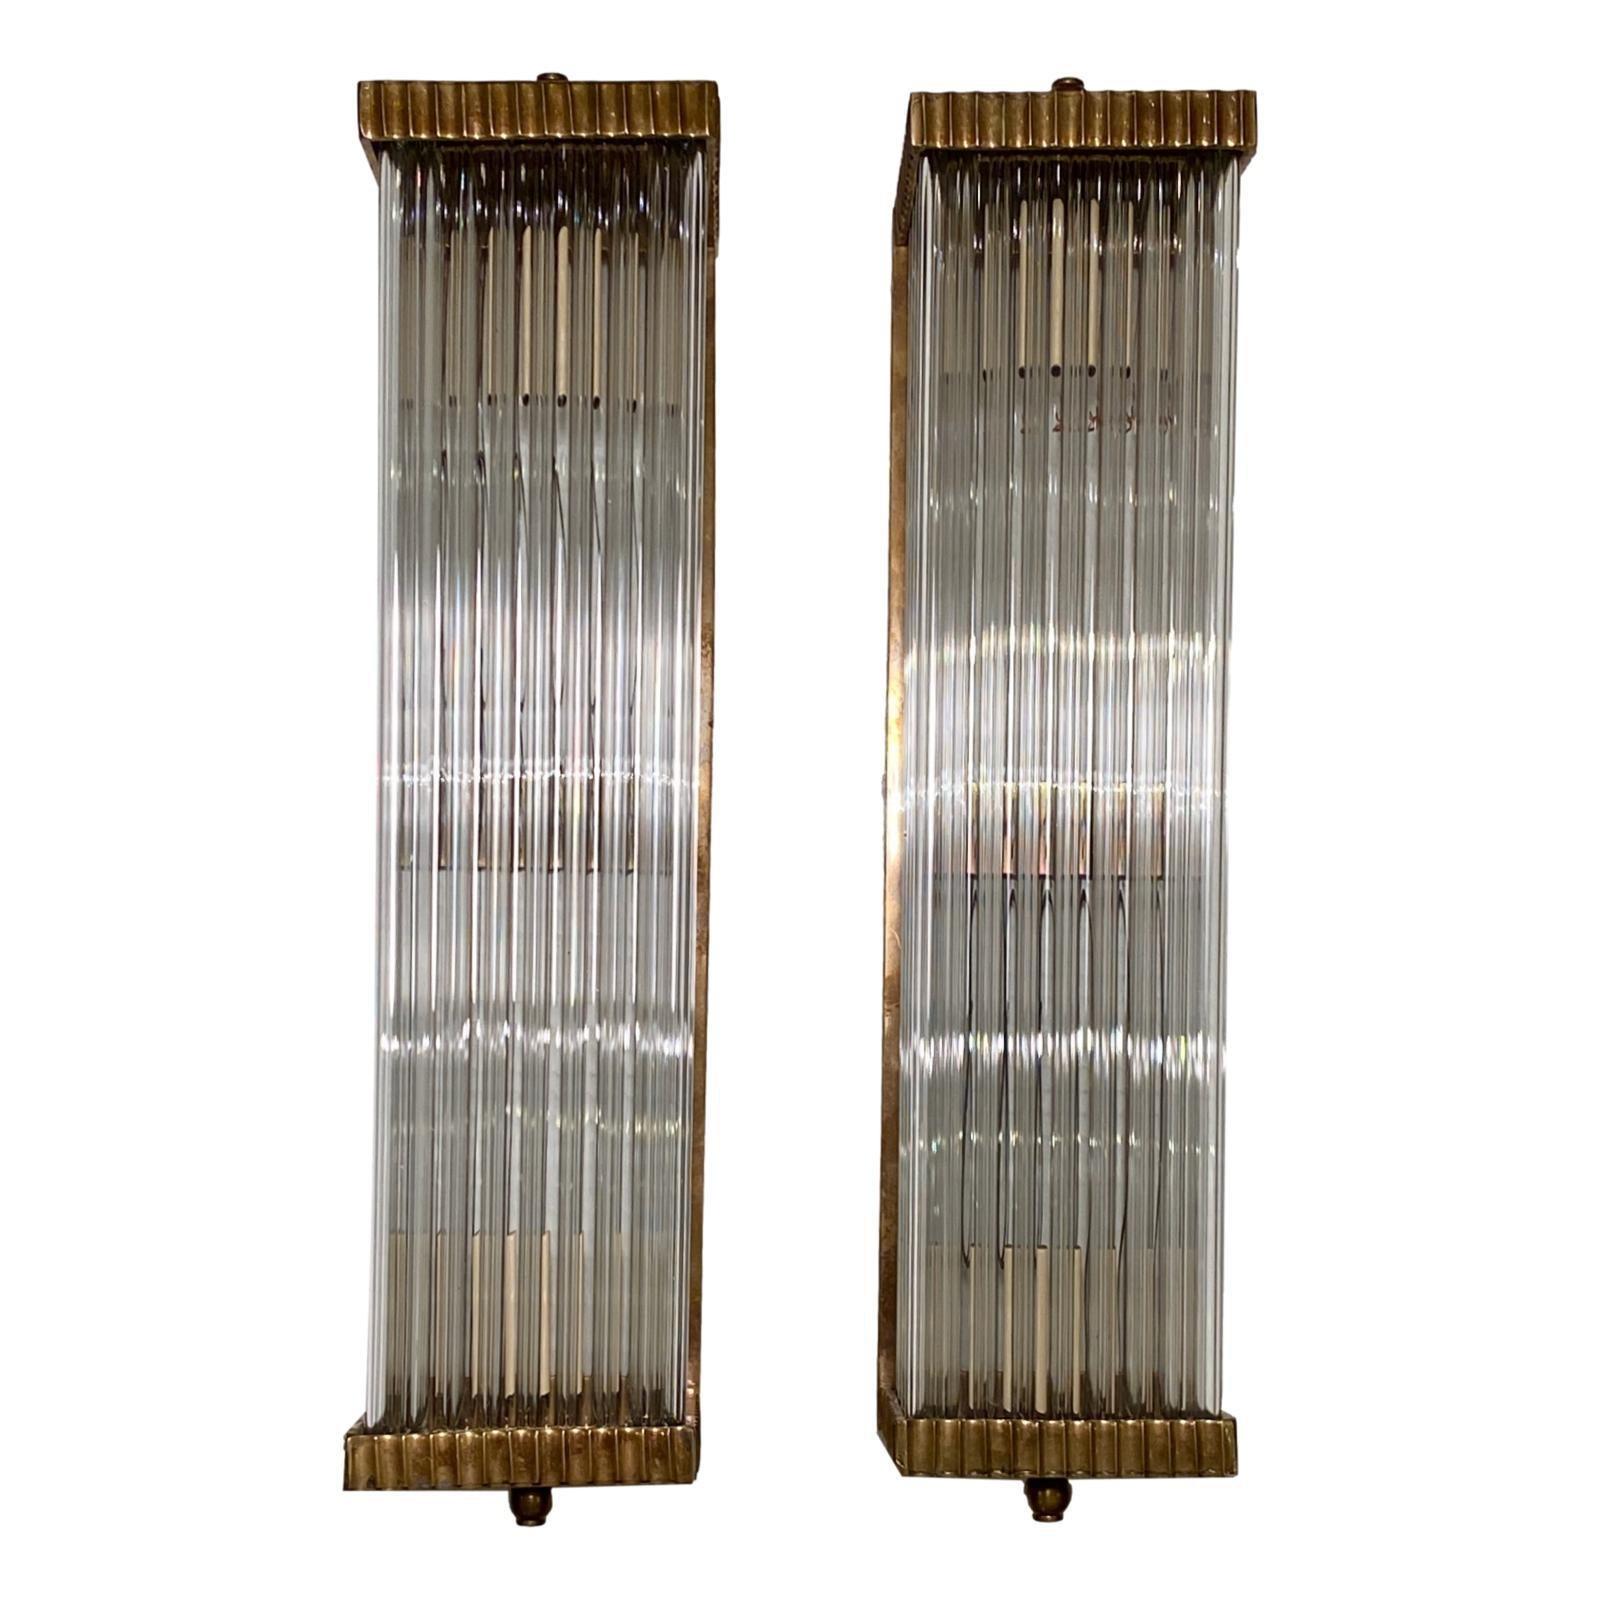 Set of Rectangular Glass Rods Sconces, Sold Per Pair